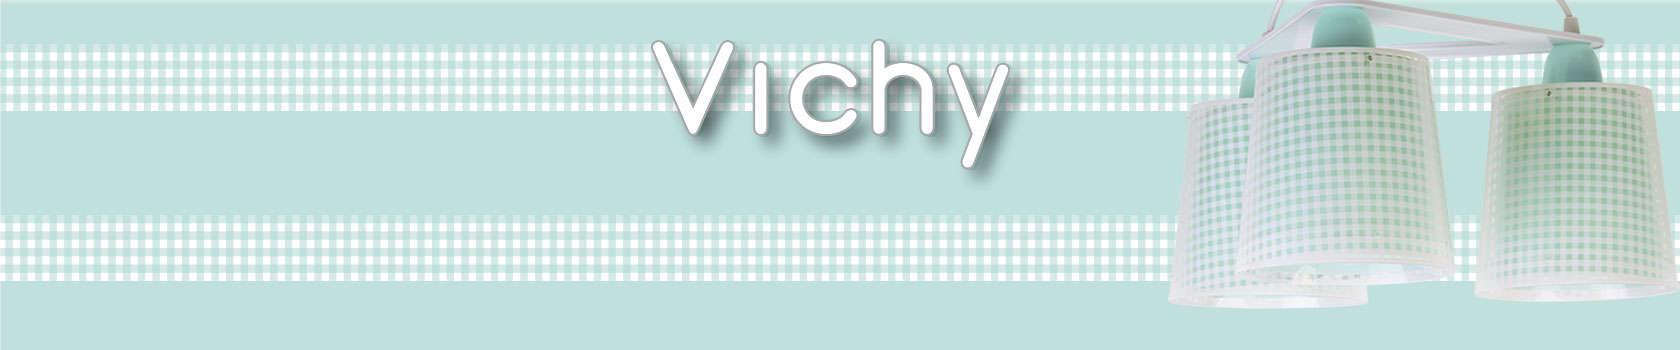 Vichy Green